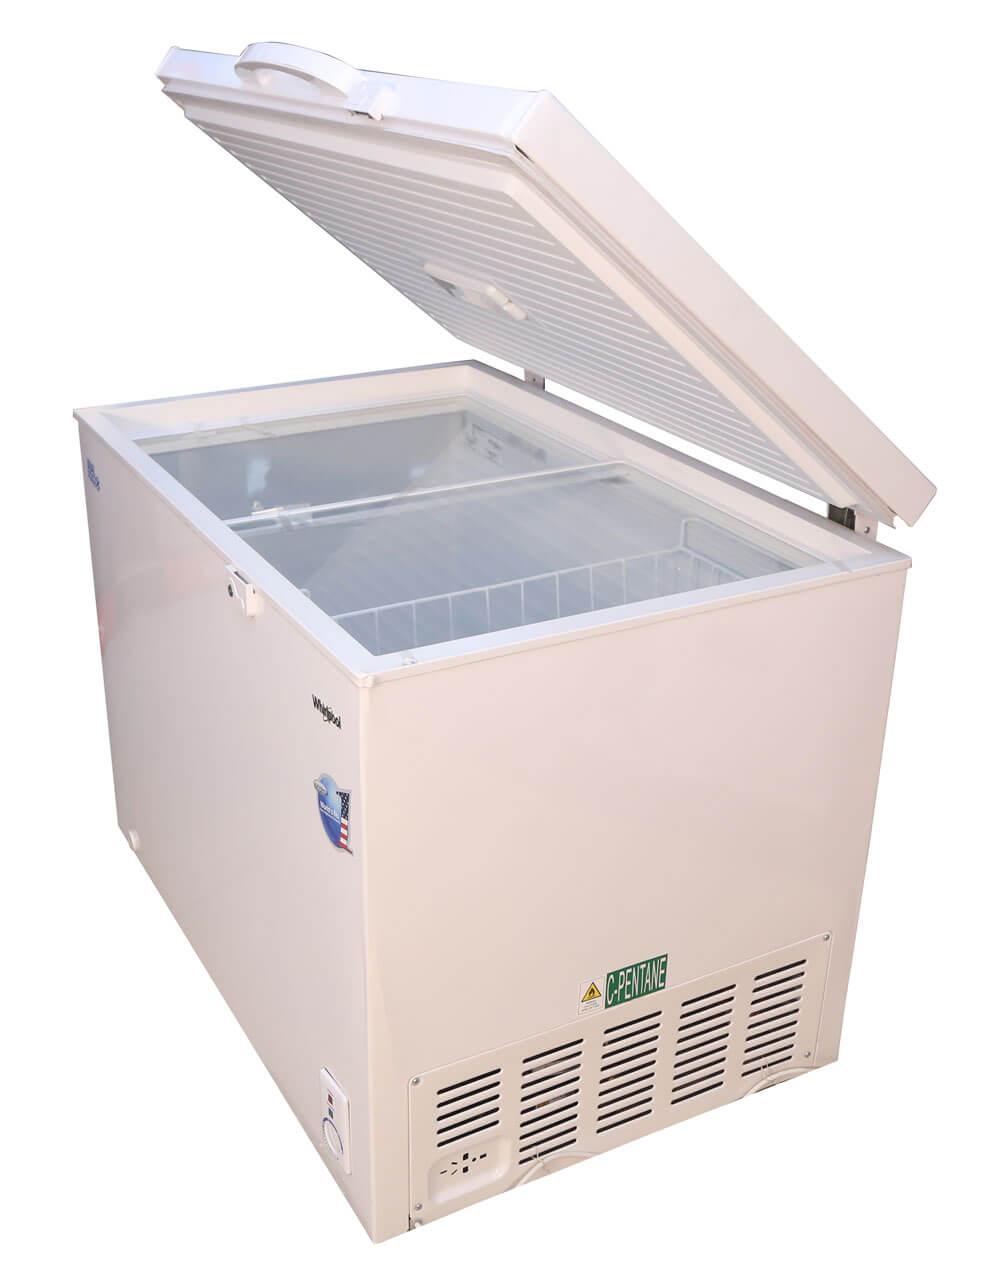 Whirlpool Chest Freezer 400 Ltr - WCF 400